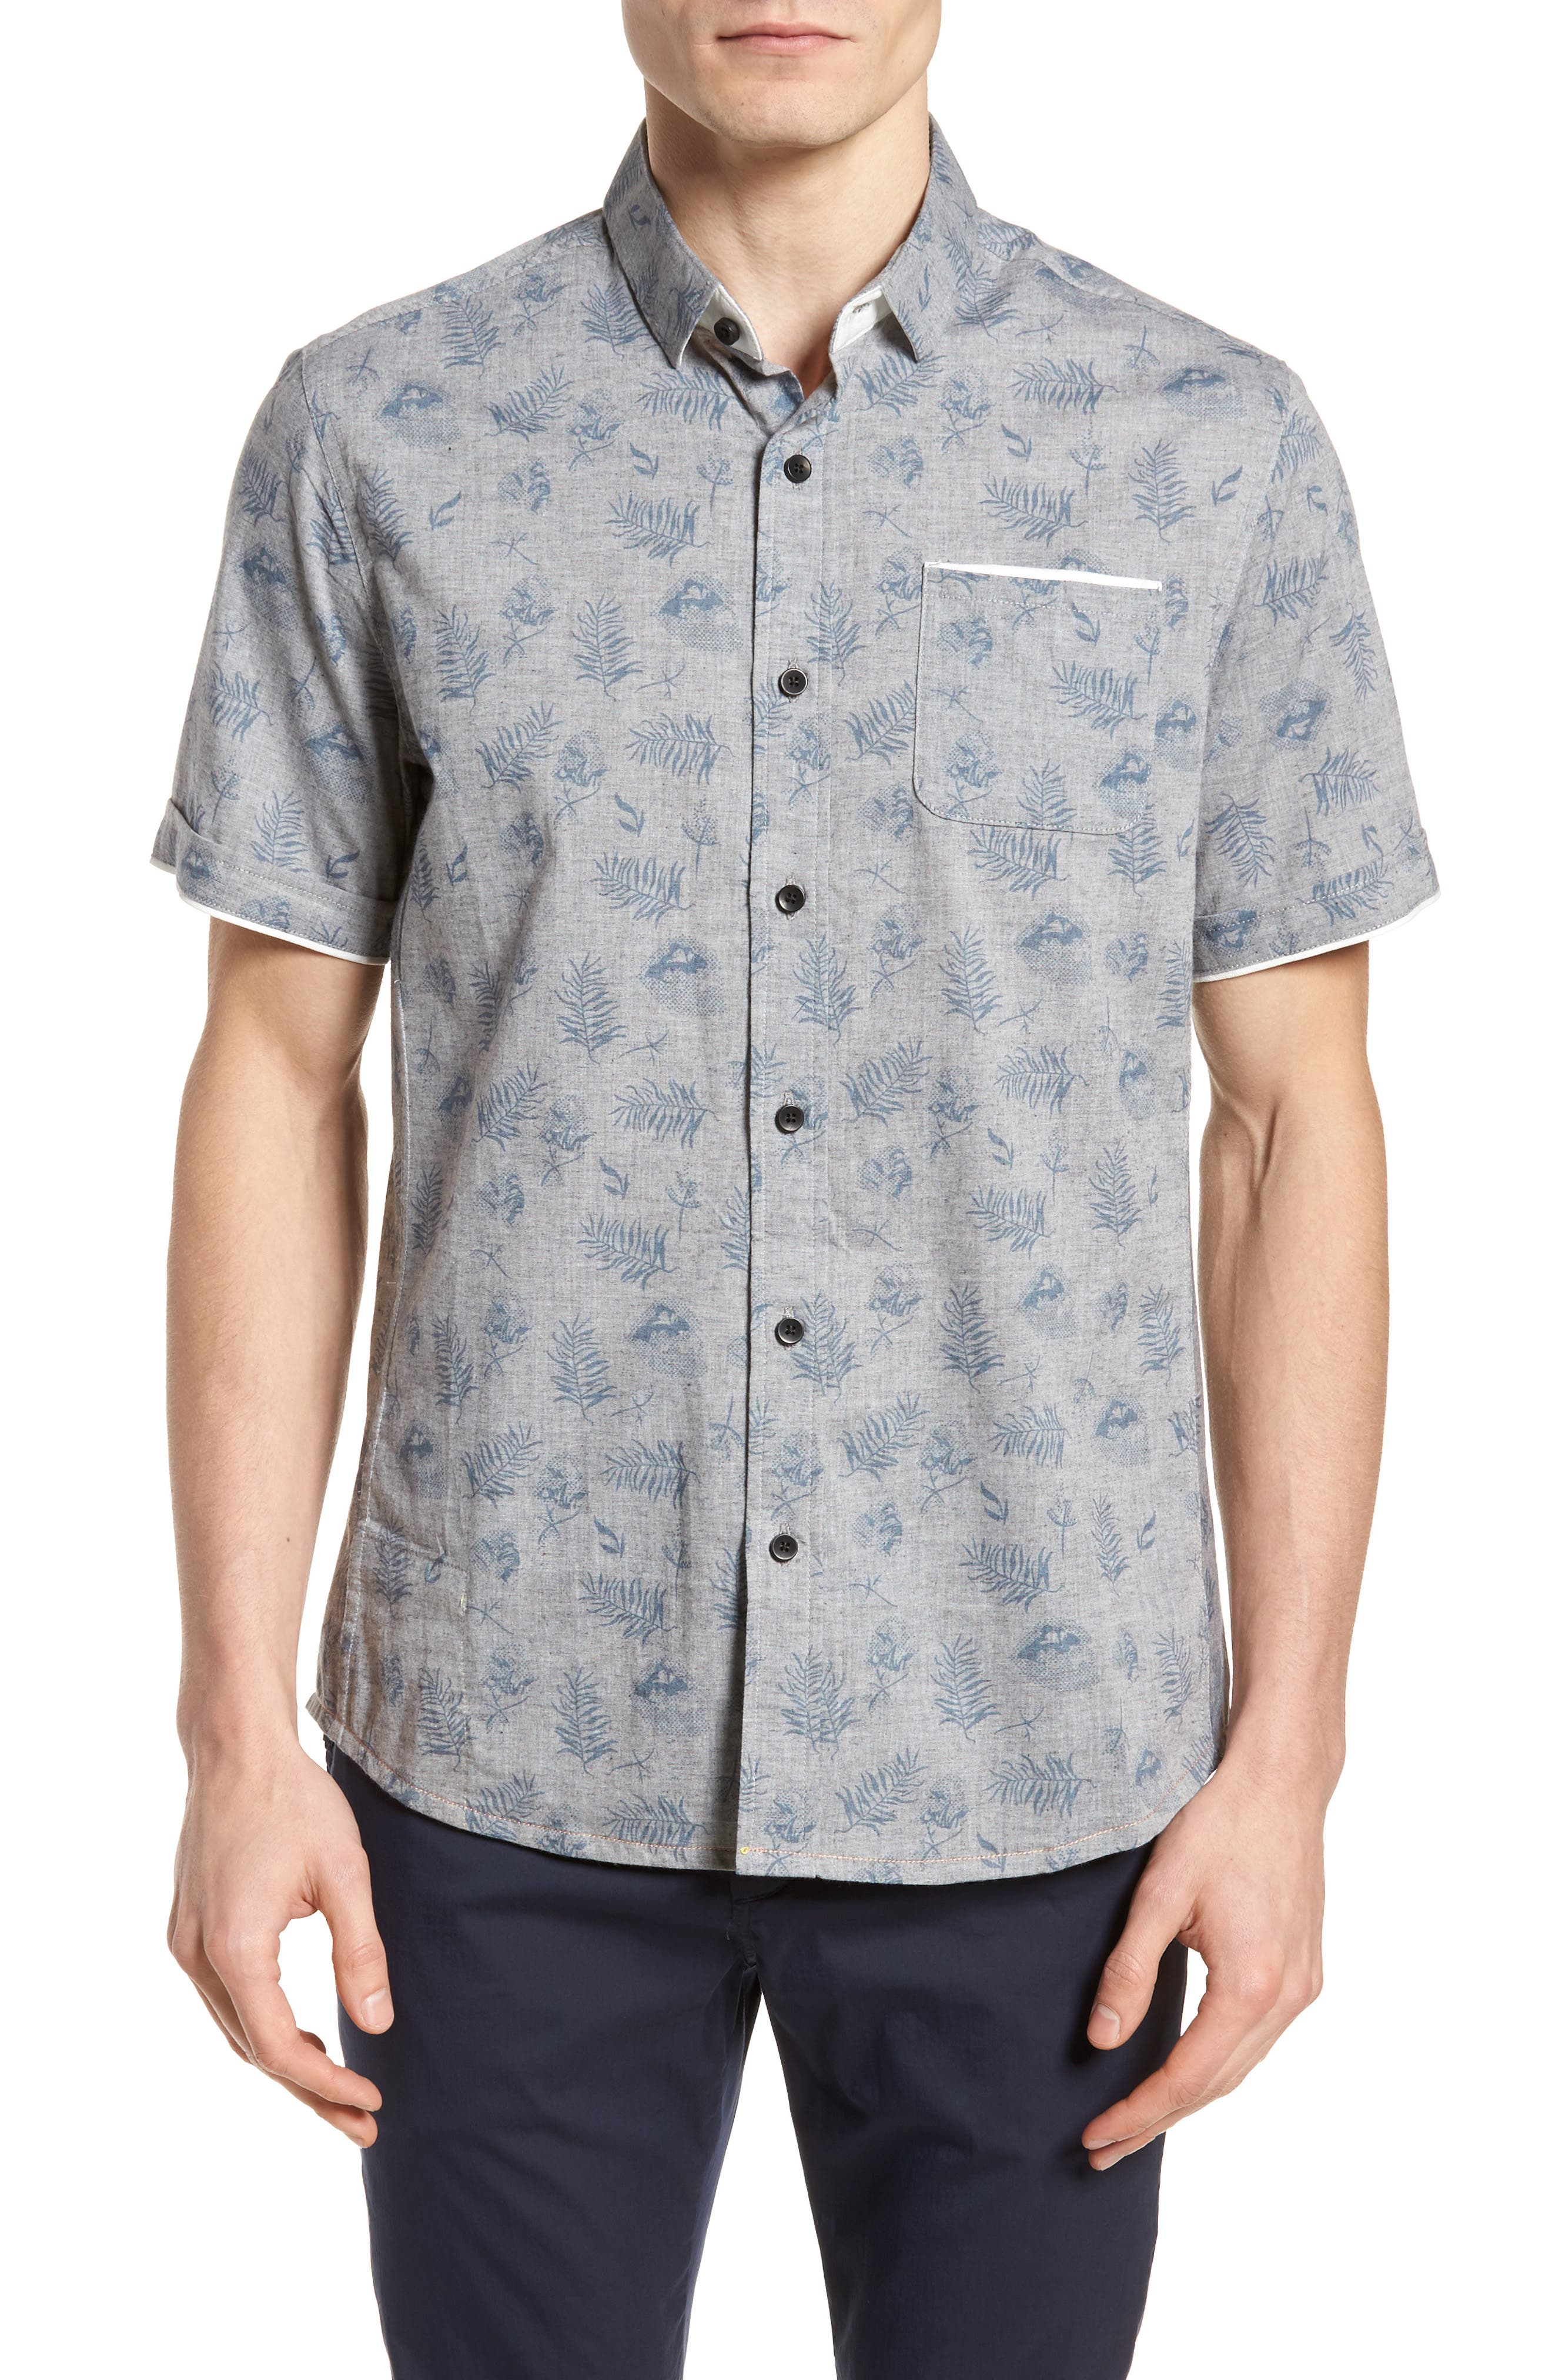 Rock Steady Woven Shirt,                             Main thumbnail 1, color,                             GREY